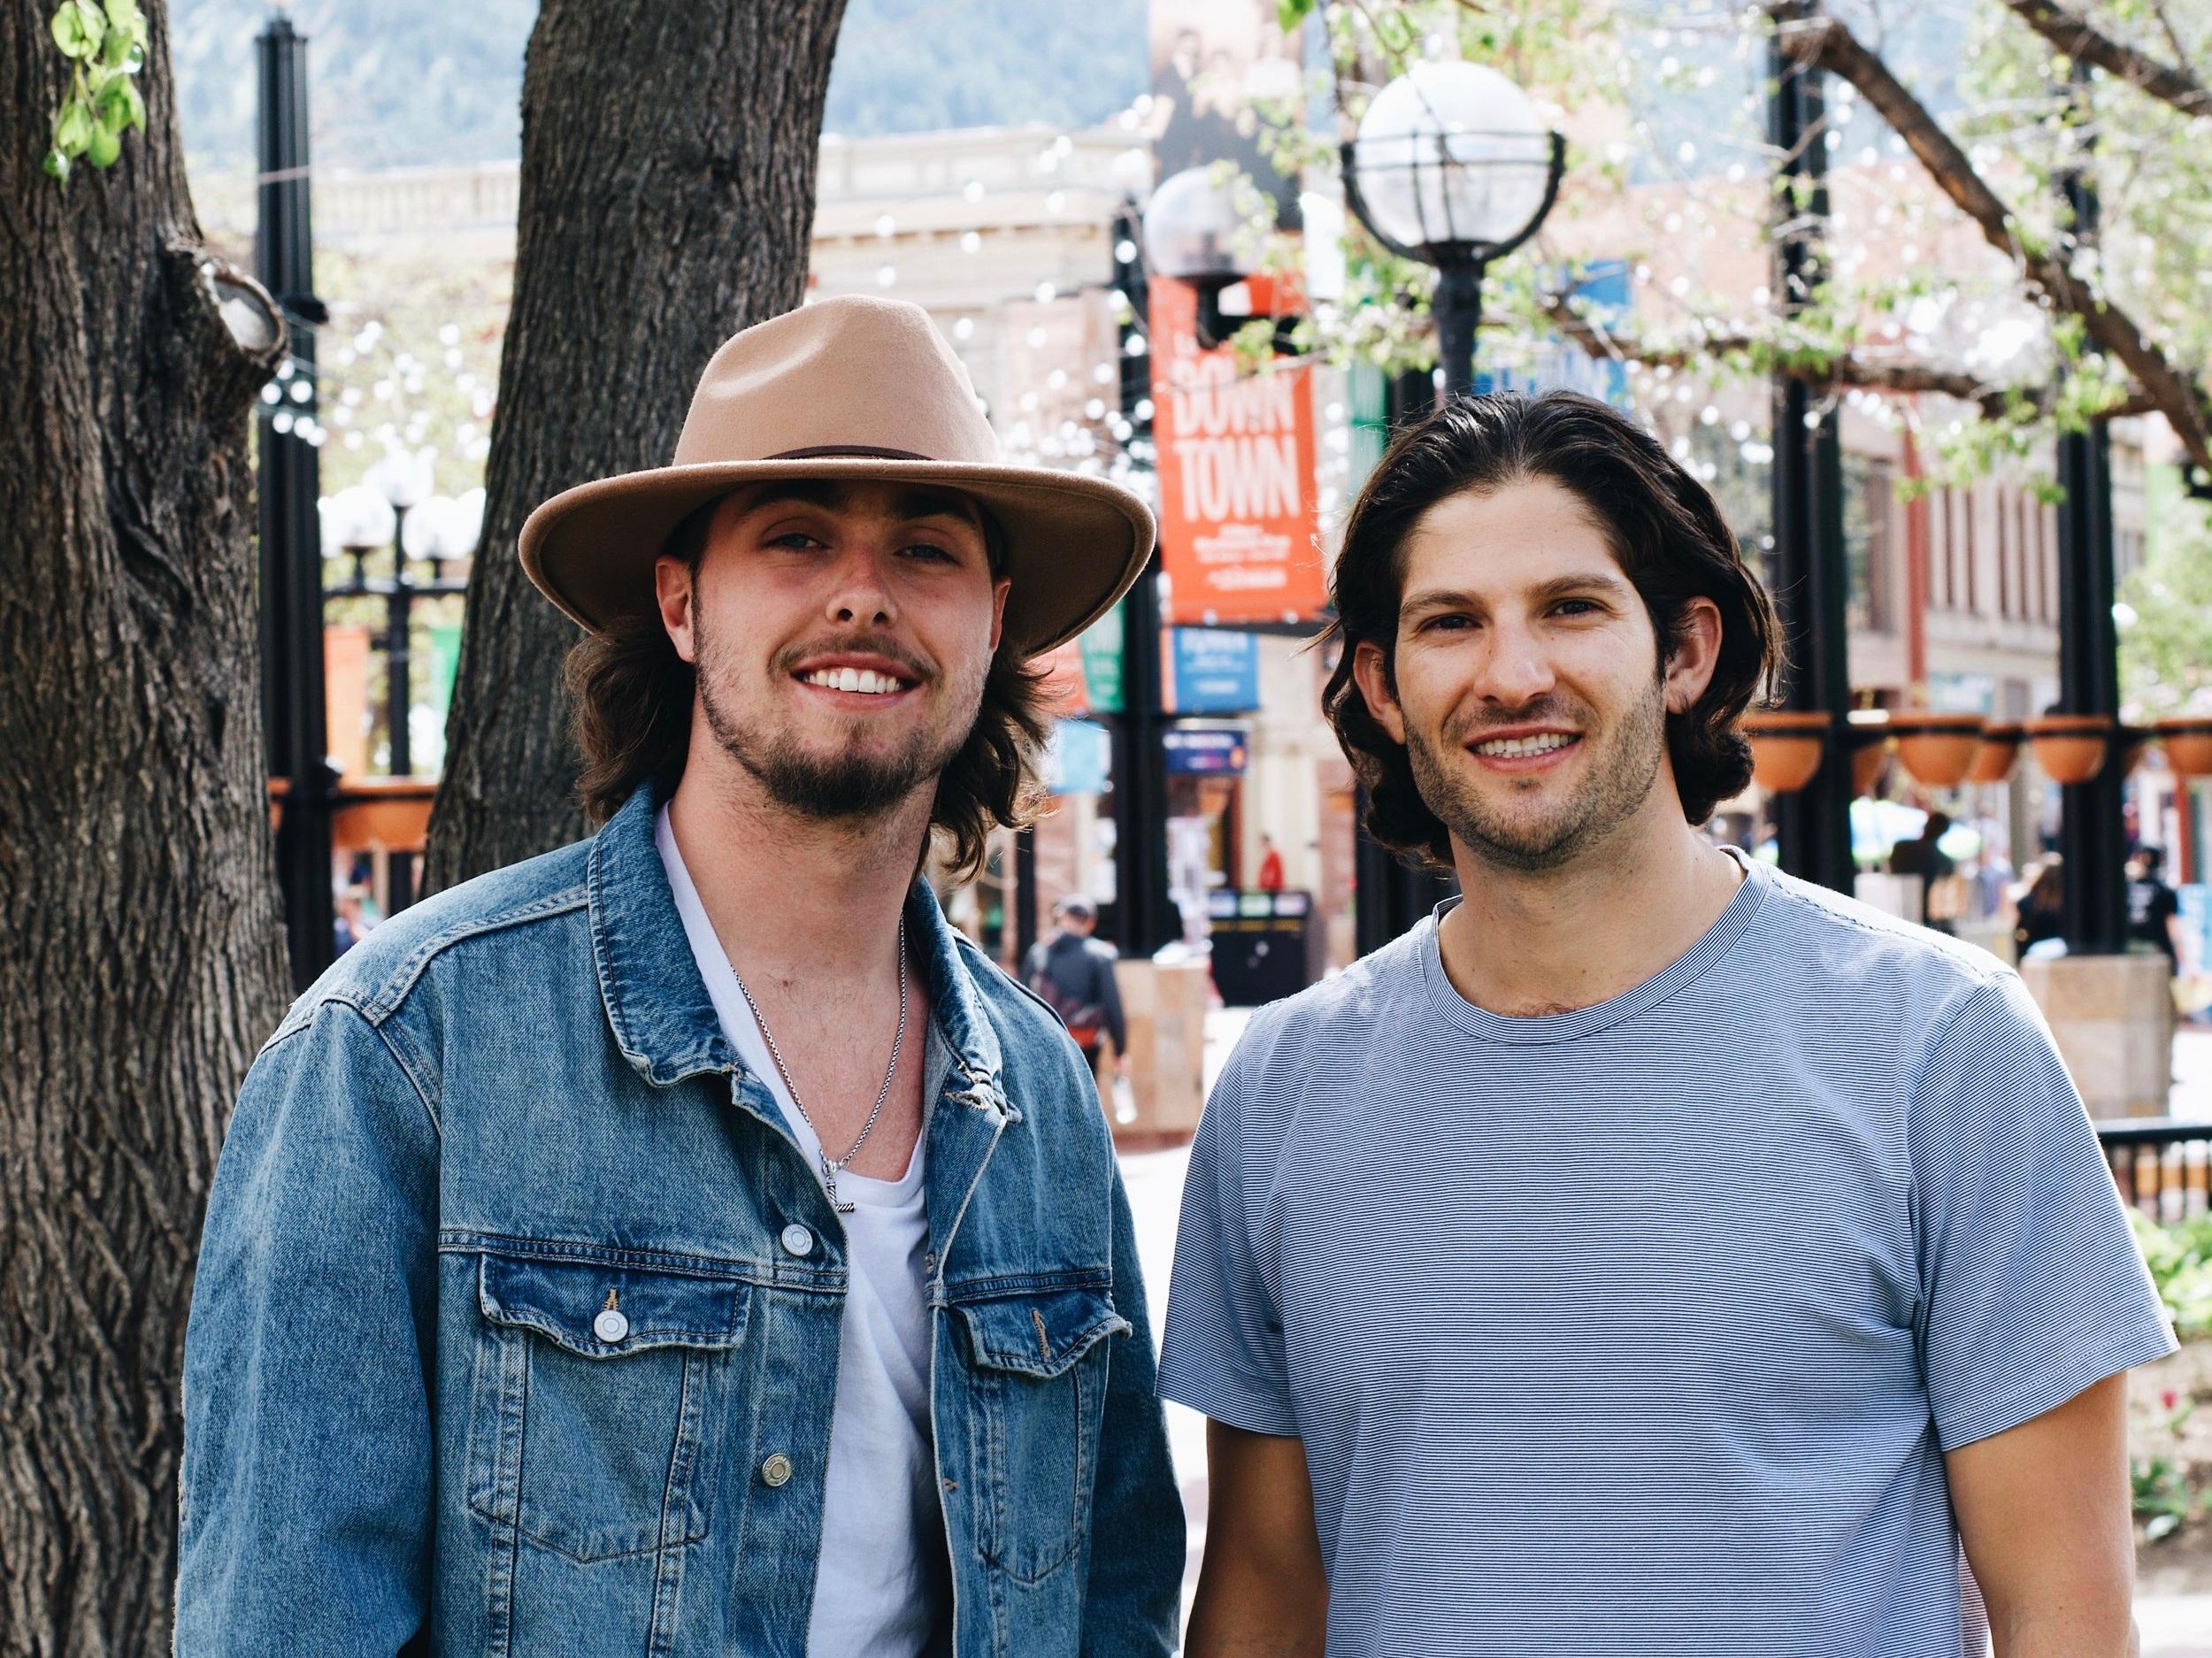 FridayLaughing Goat7am@jakestill@andyeestrella - Jake & Andy (guys)